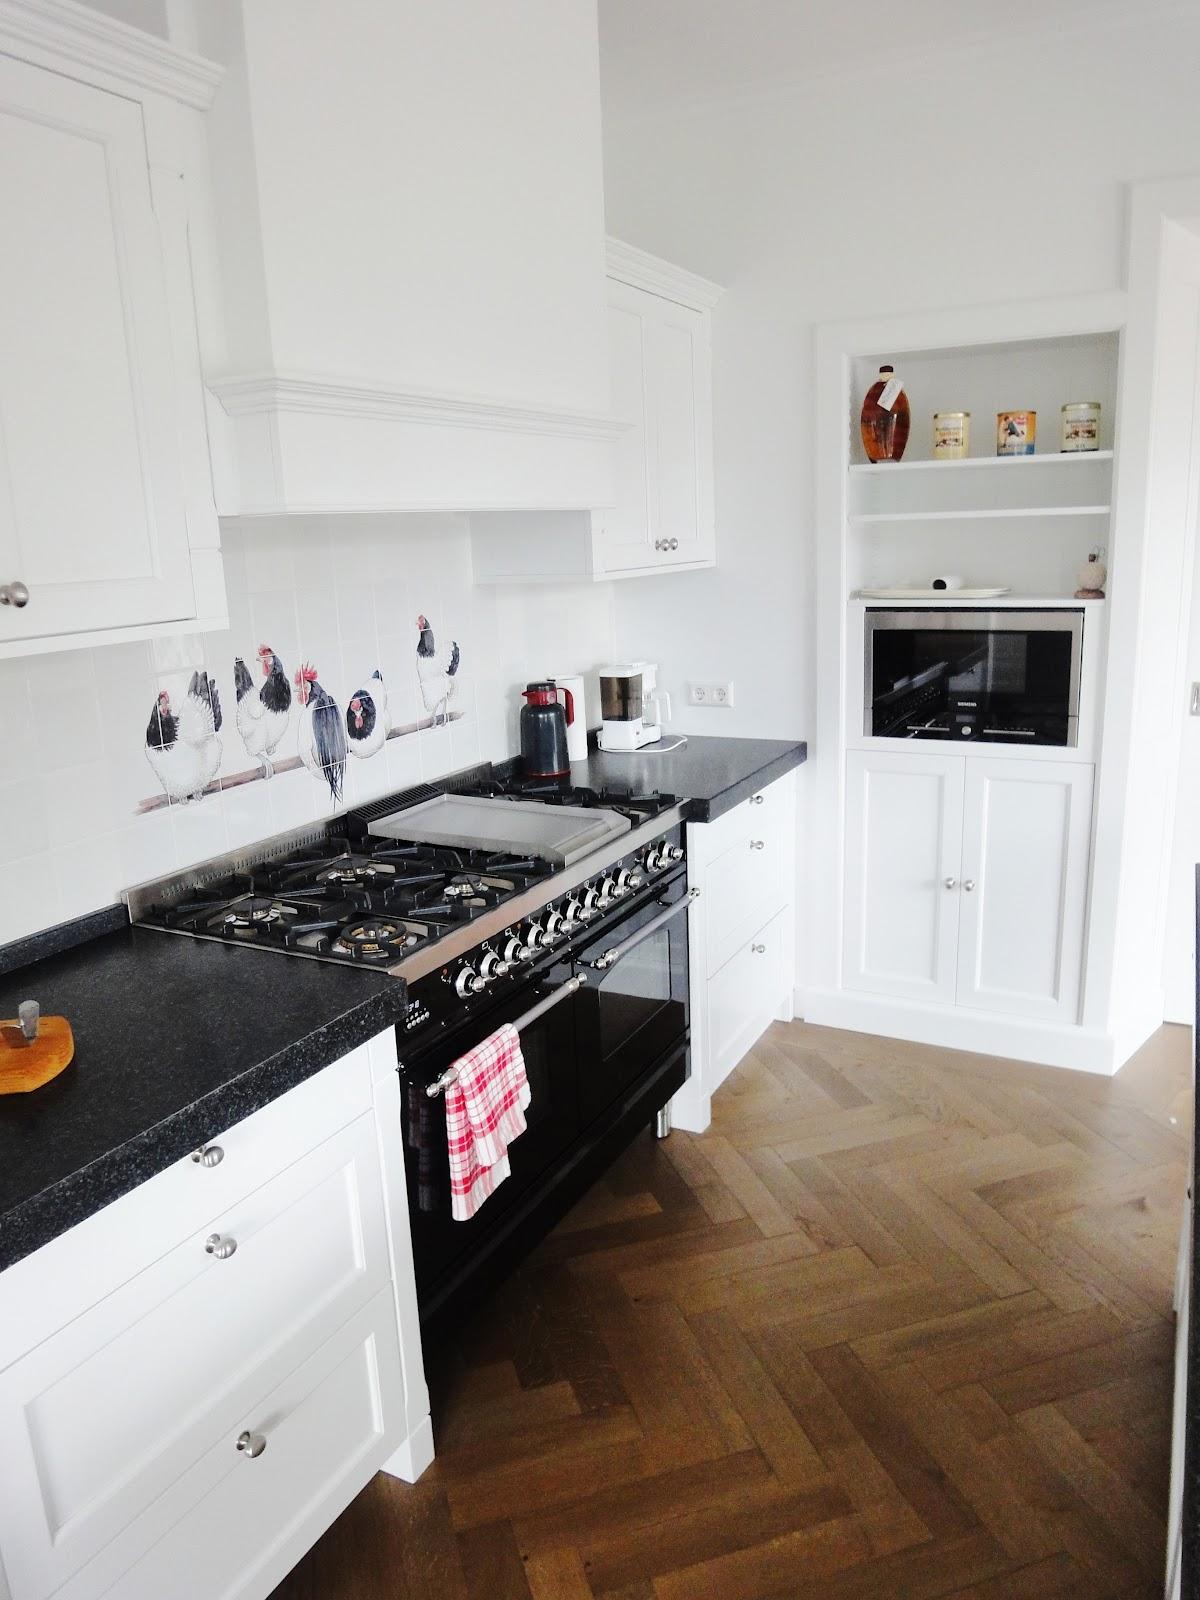 Houten keuken: Creative Kitchen Backsplash Ideas